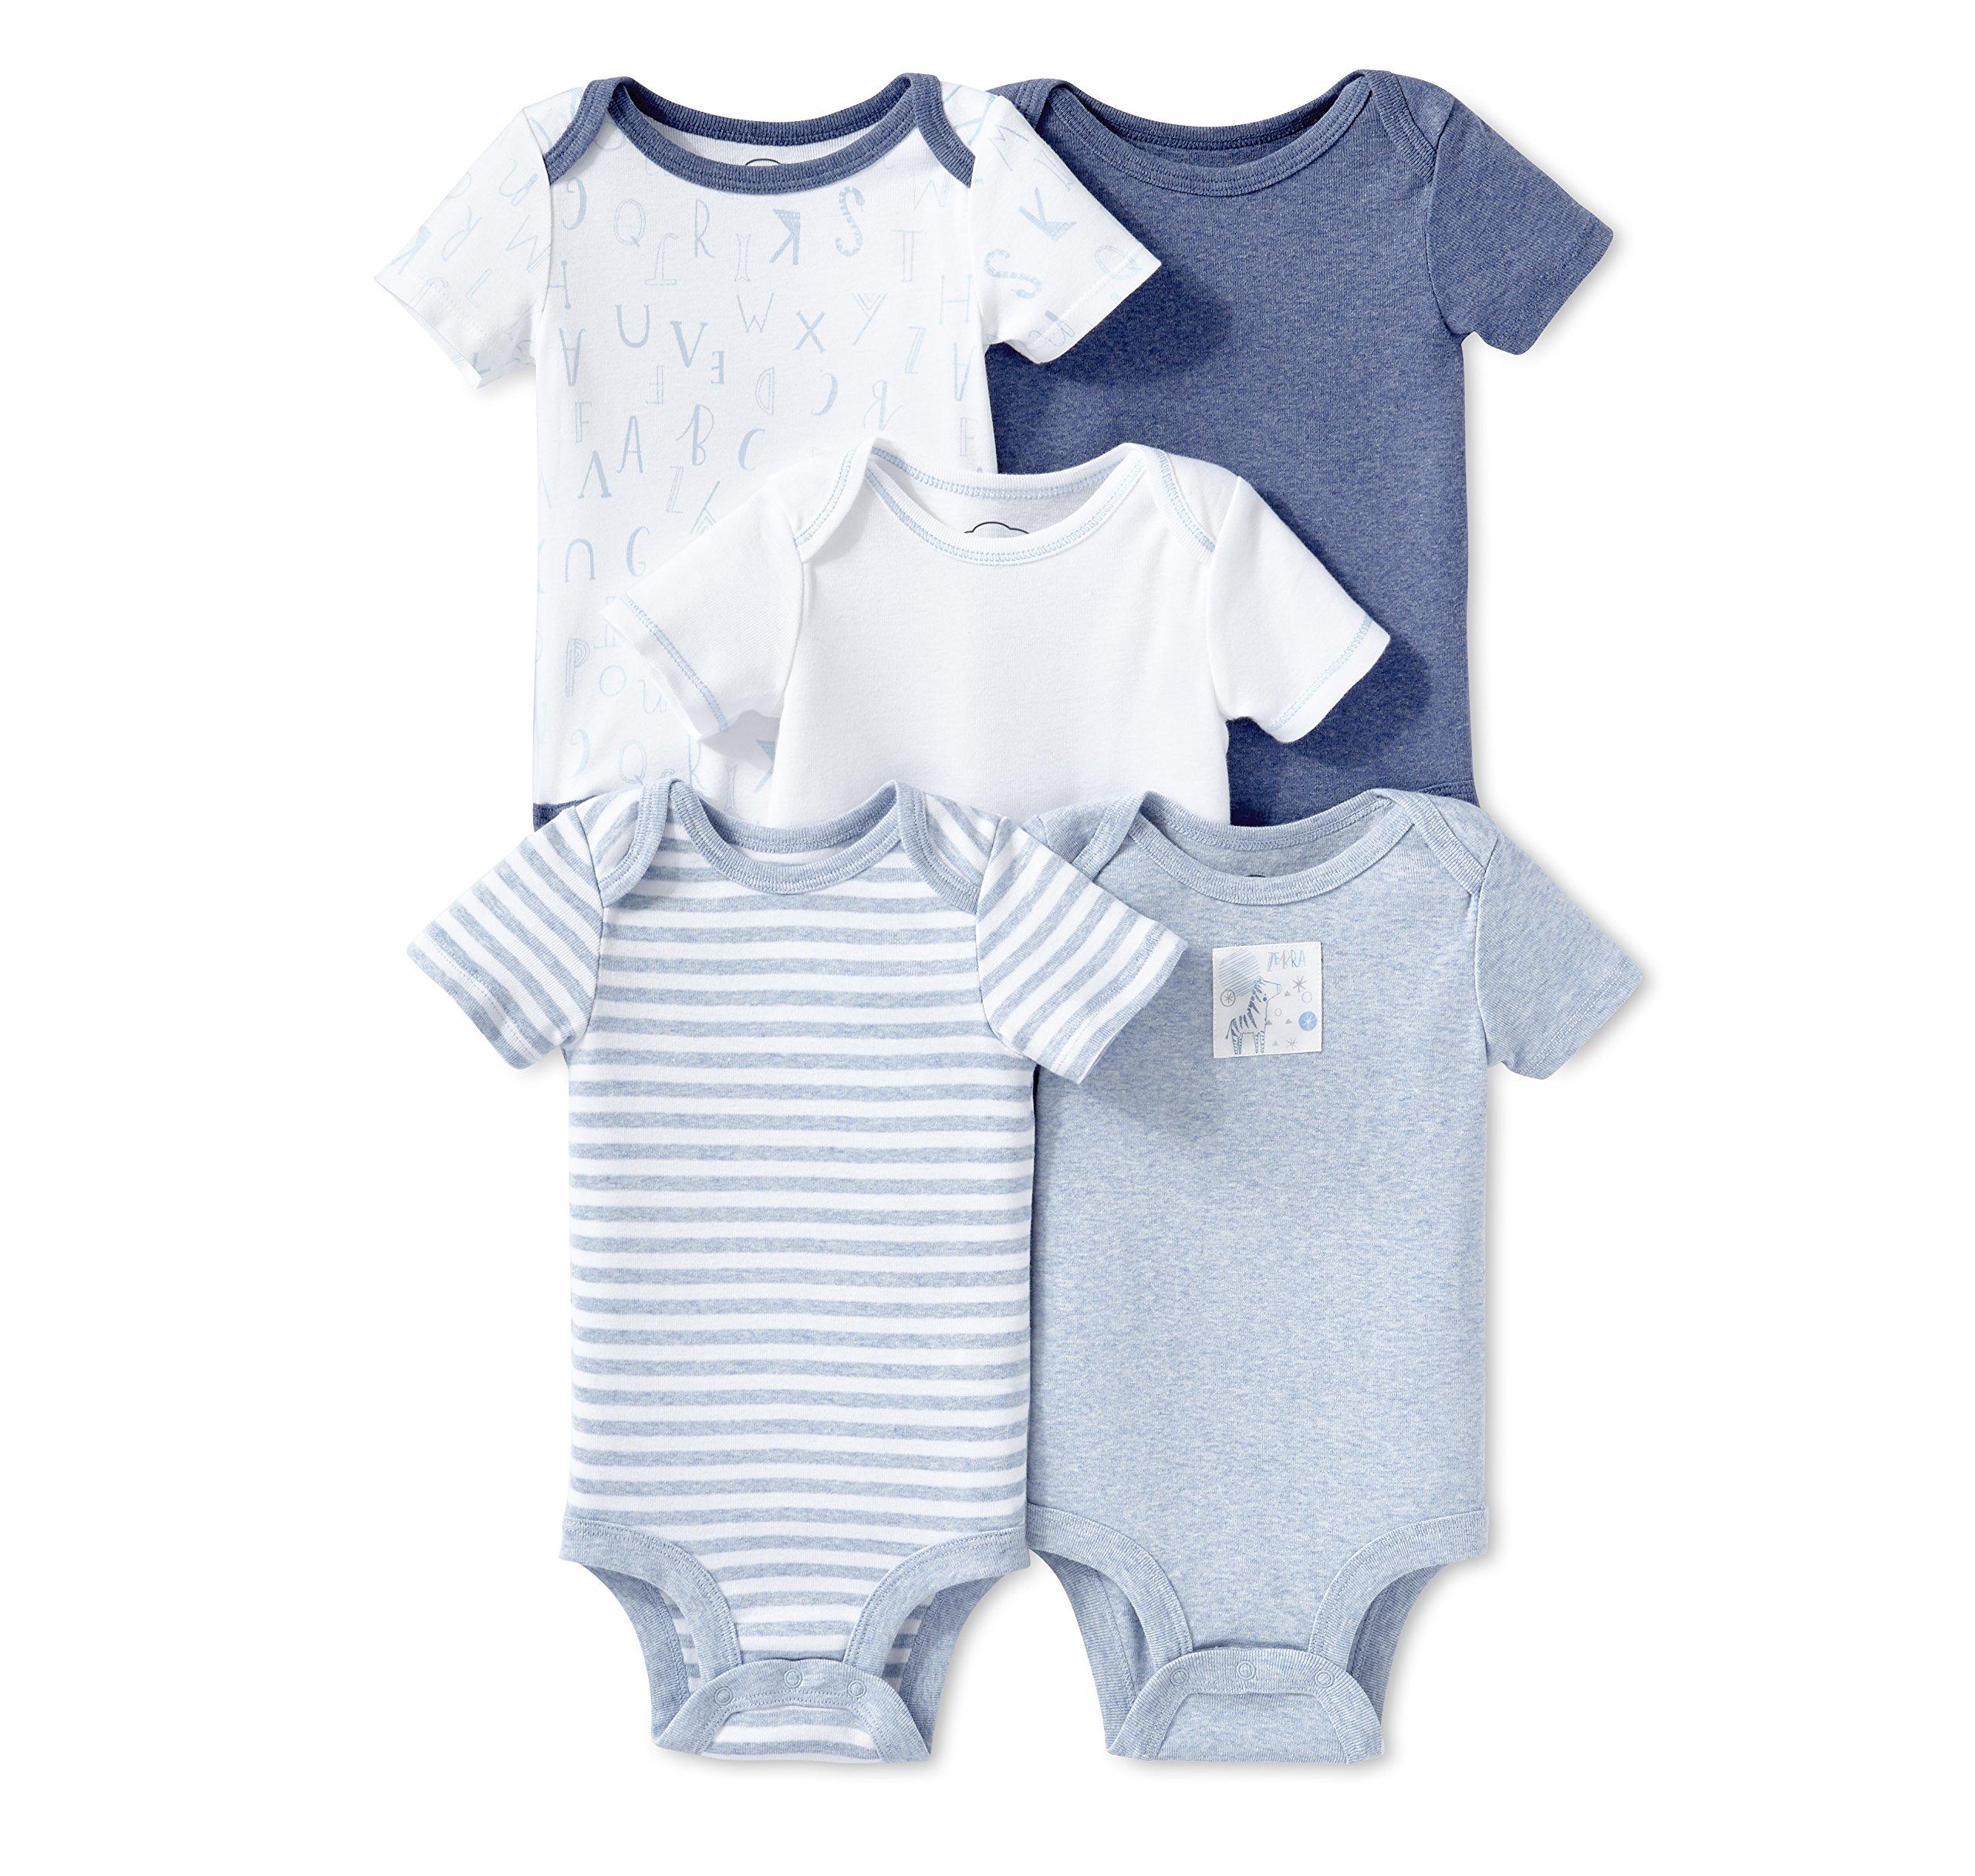 Lamaze Baby Organic Essentials 5 Pack Shortsleeve Bodysuits, Blue, 18M